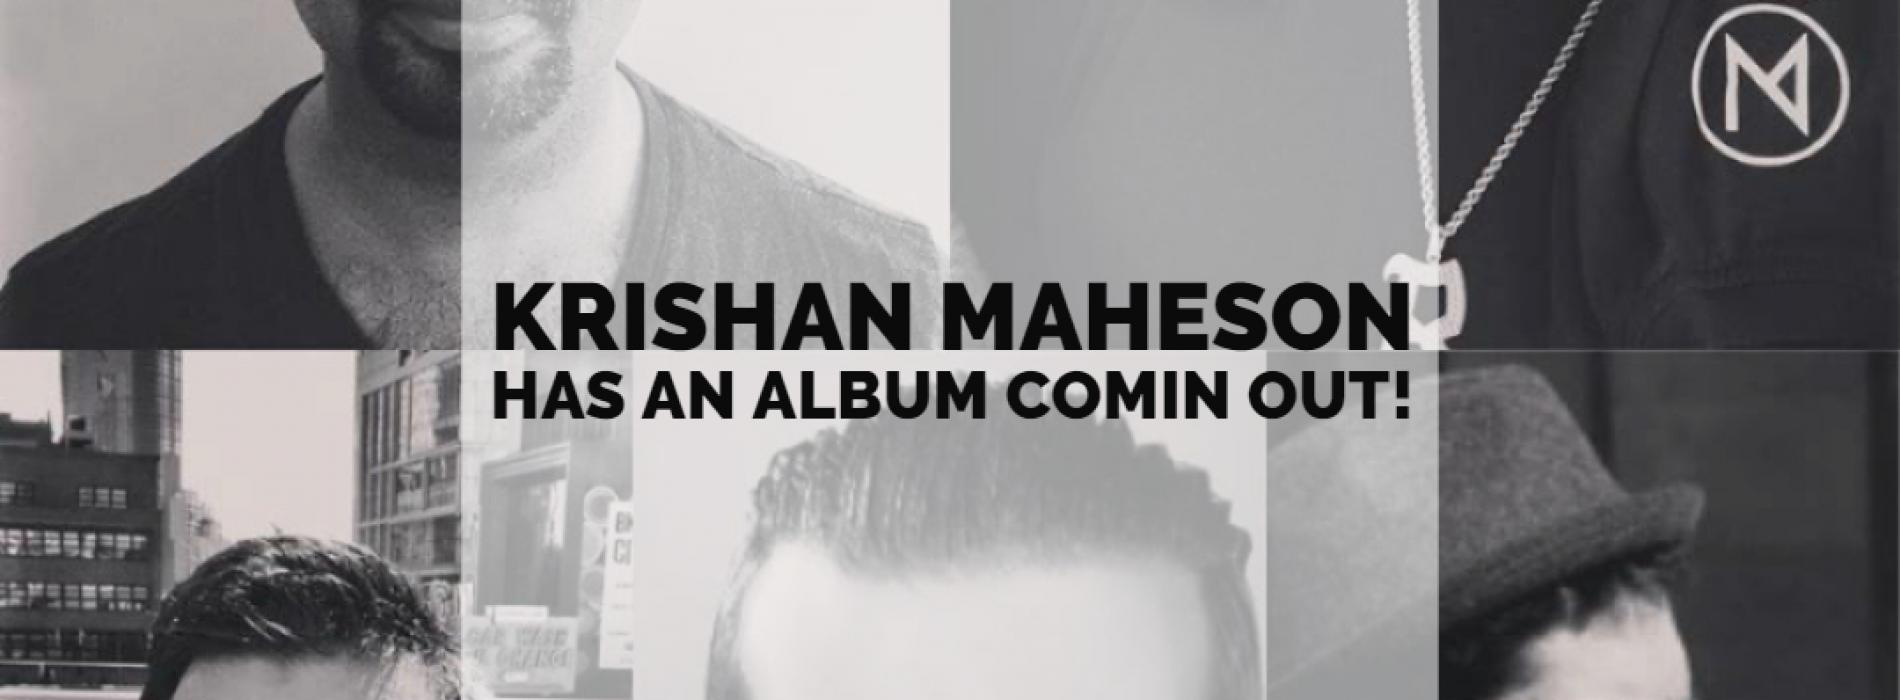 Krishan Maheson Announces A New Album!